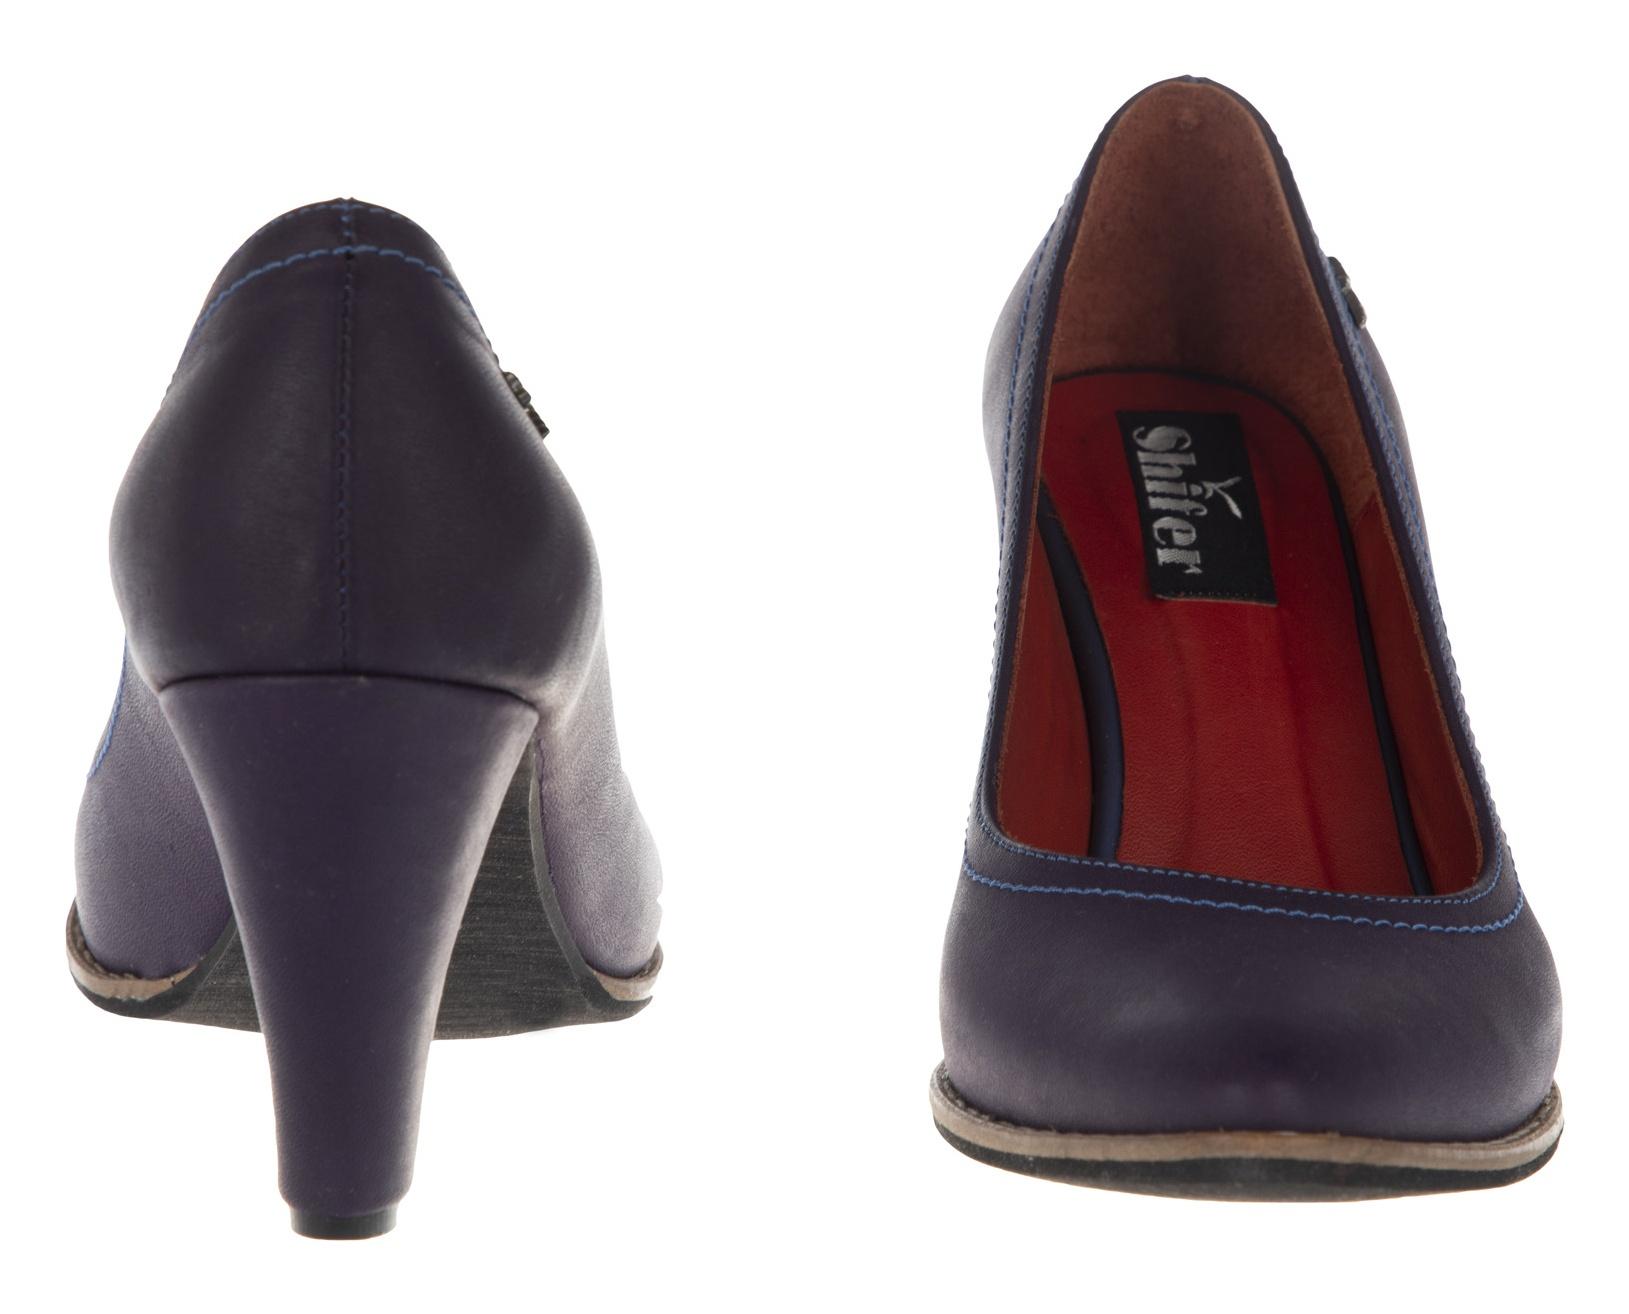 کفش نه شیفر مدل 5224A-115